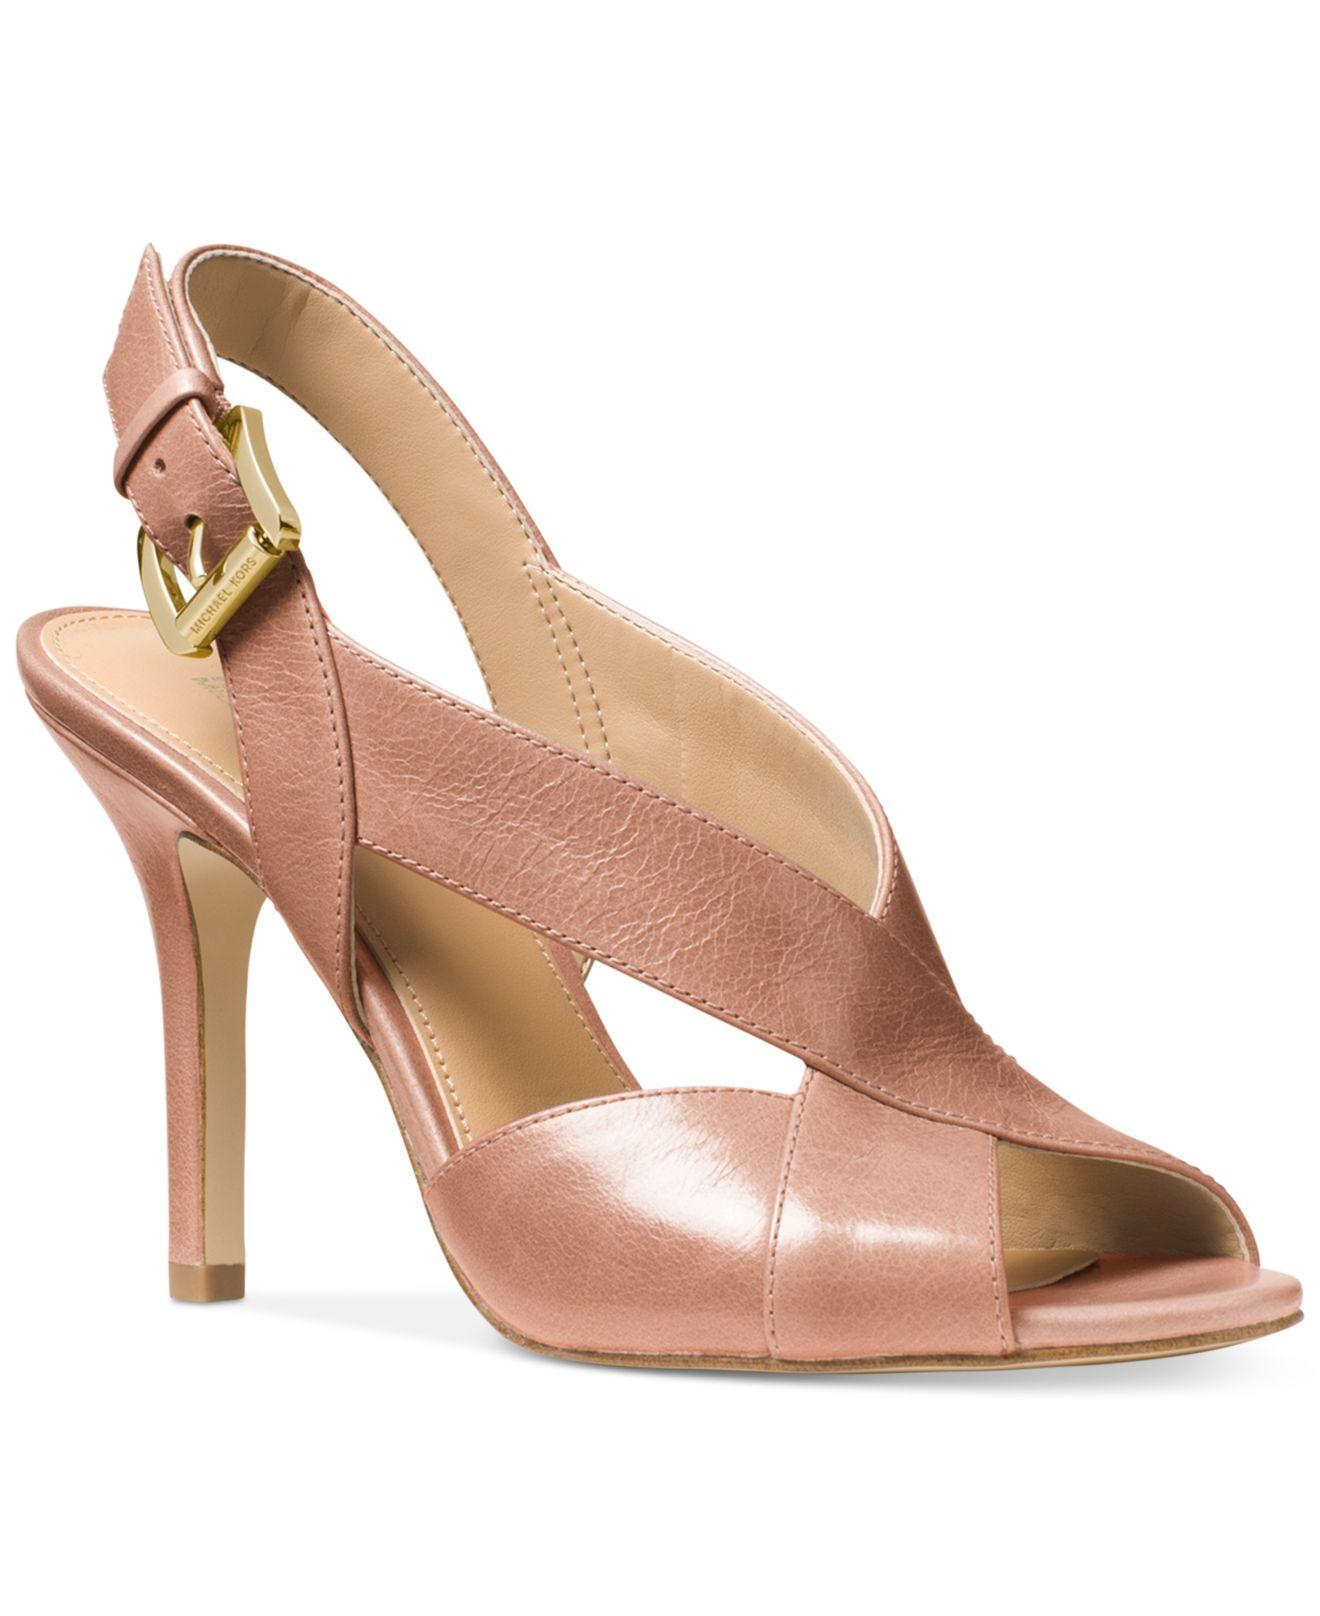 Macys Michael Kors Shoes Heels